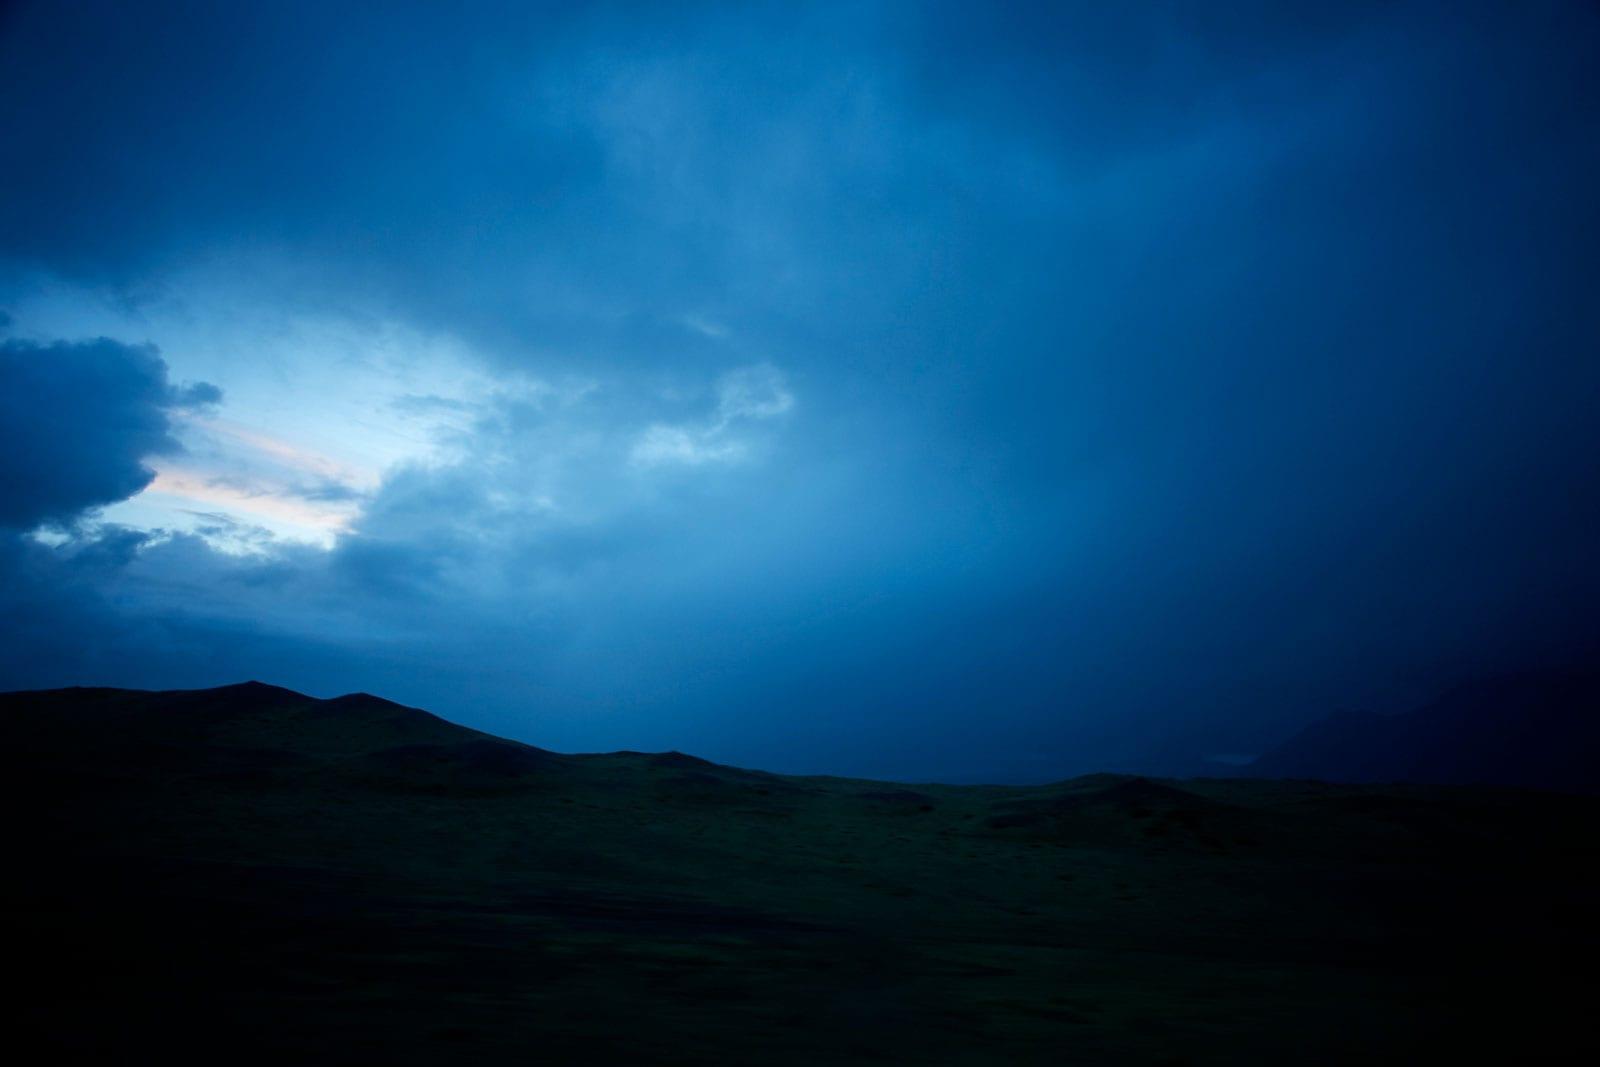 dunkelblauer Wolkenhimmel über dunkler Landschaft